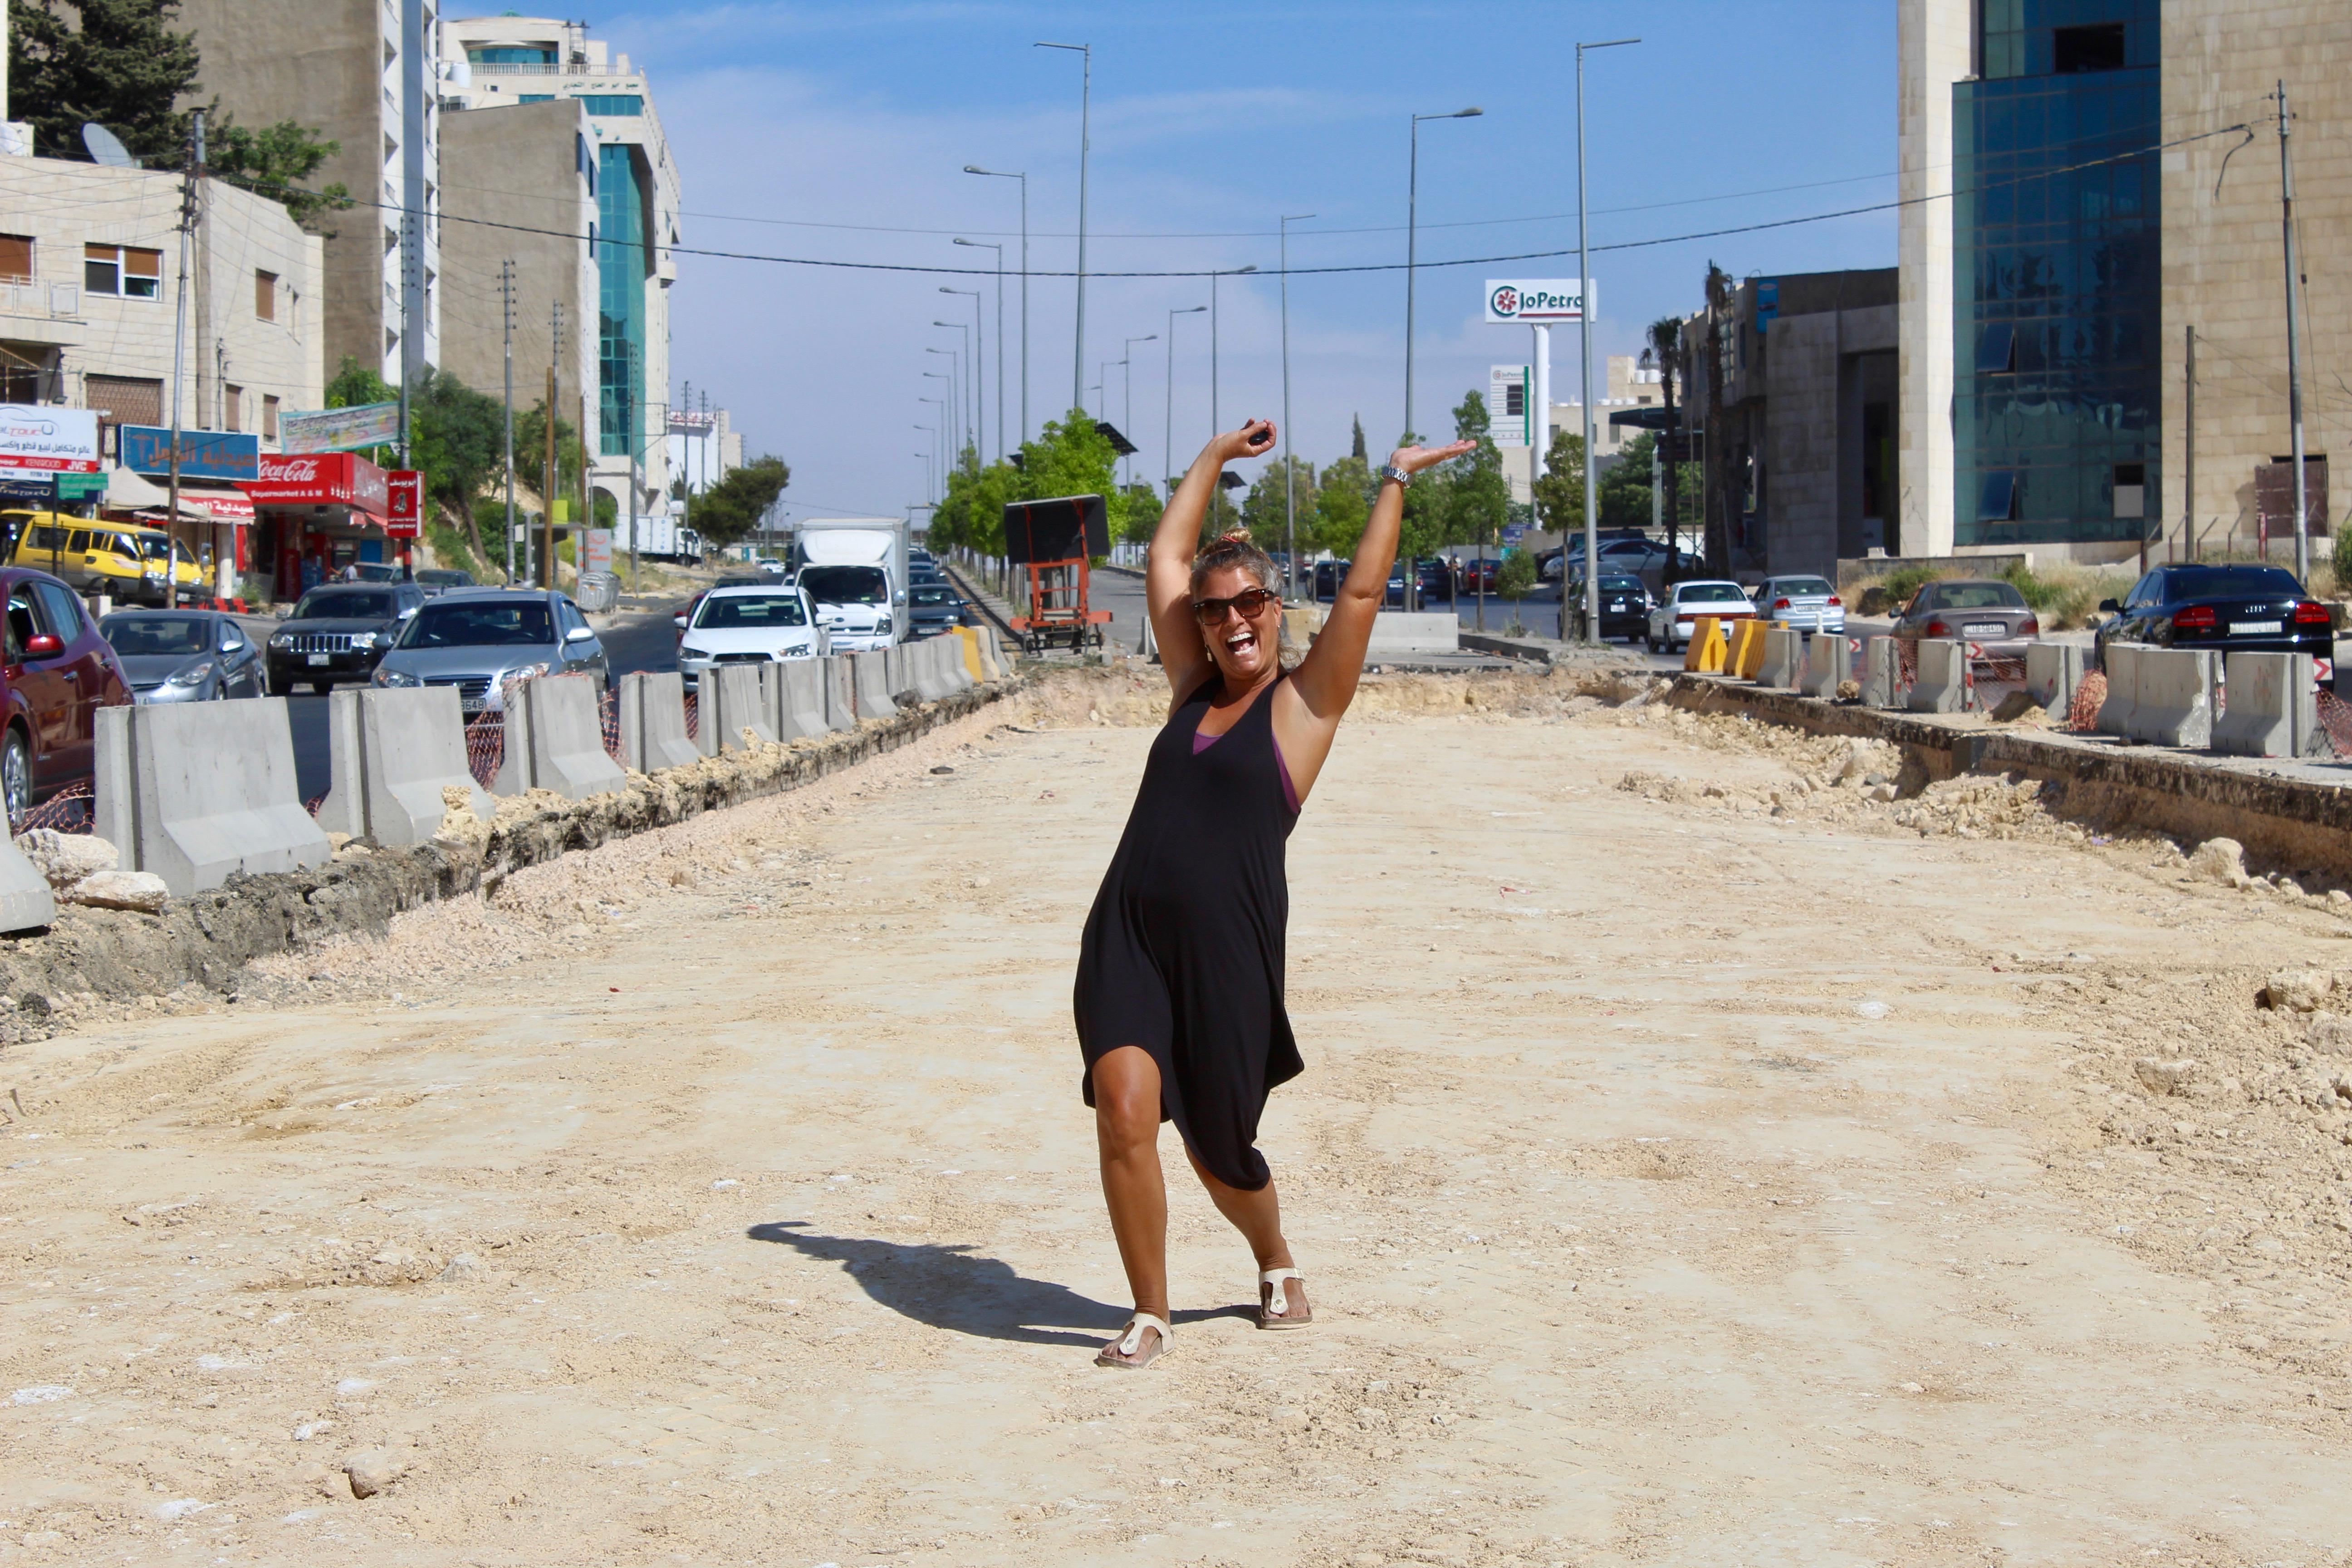 2019 - Amman, Jordan - Walking our own path along a busy street!